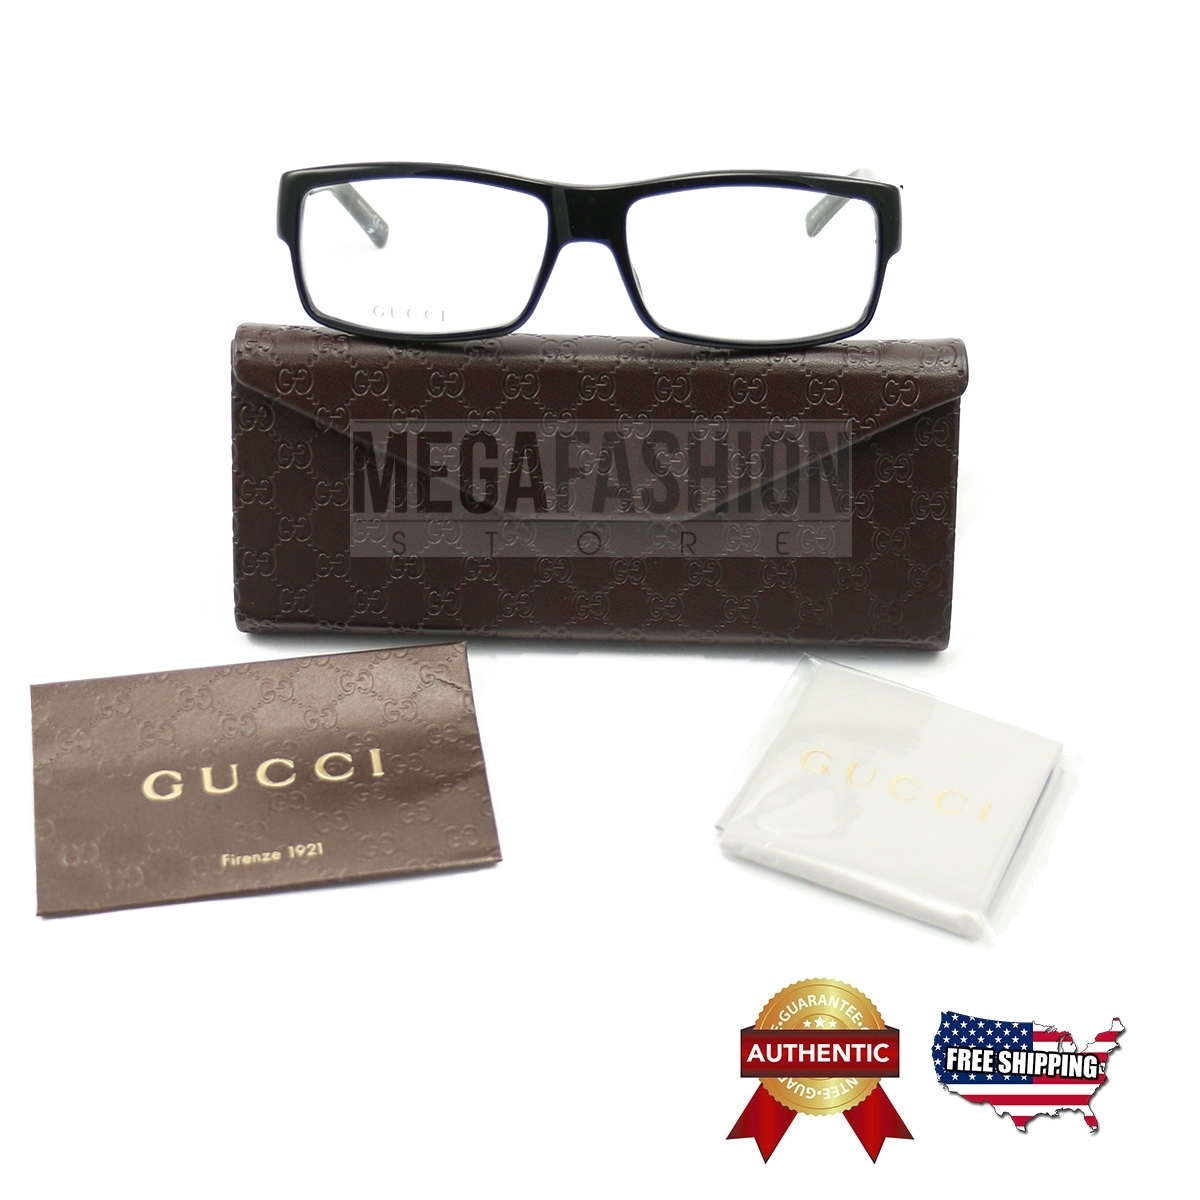 New gucci eyeglasses men black and similar items jpg 1200x1200 Gucci  eyeglasses men 7a0ecc29550